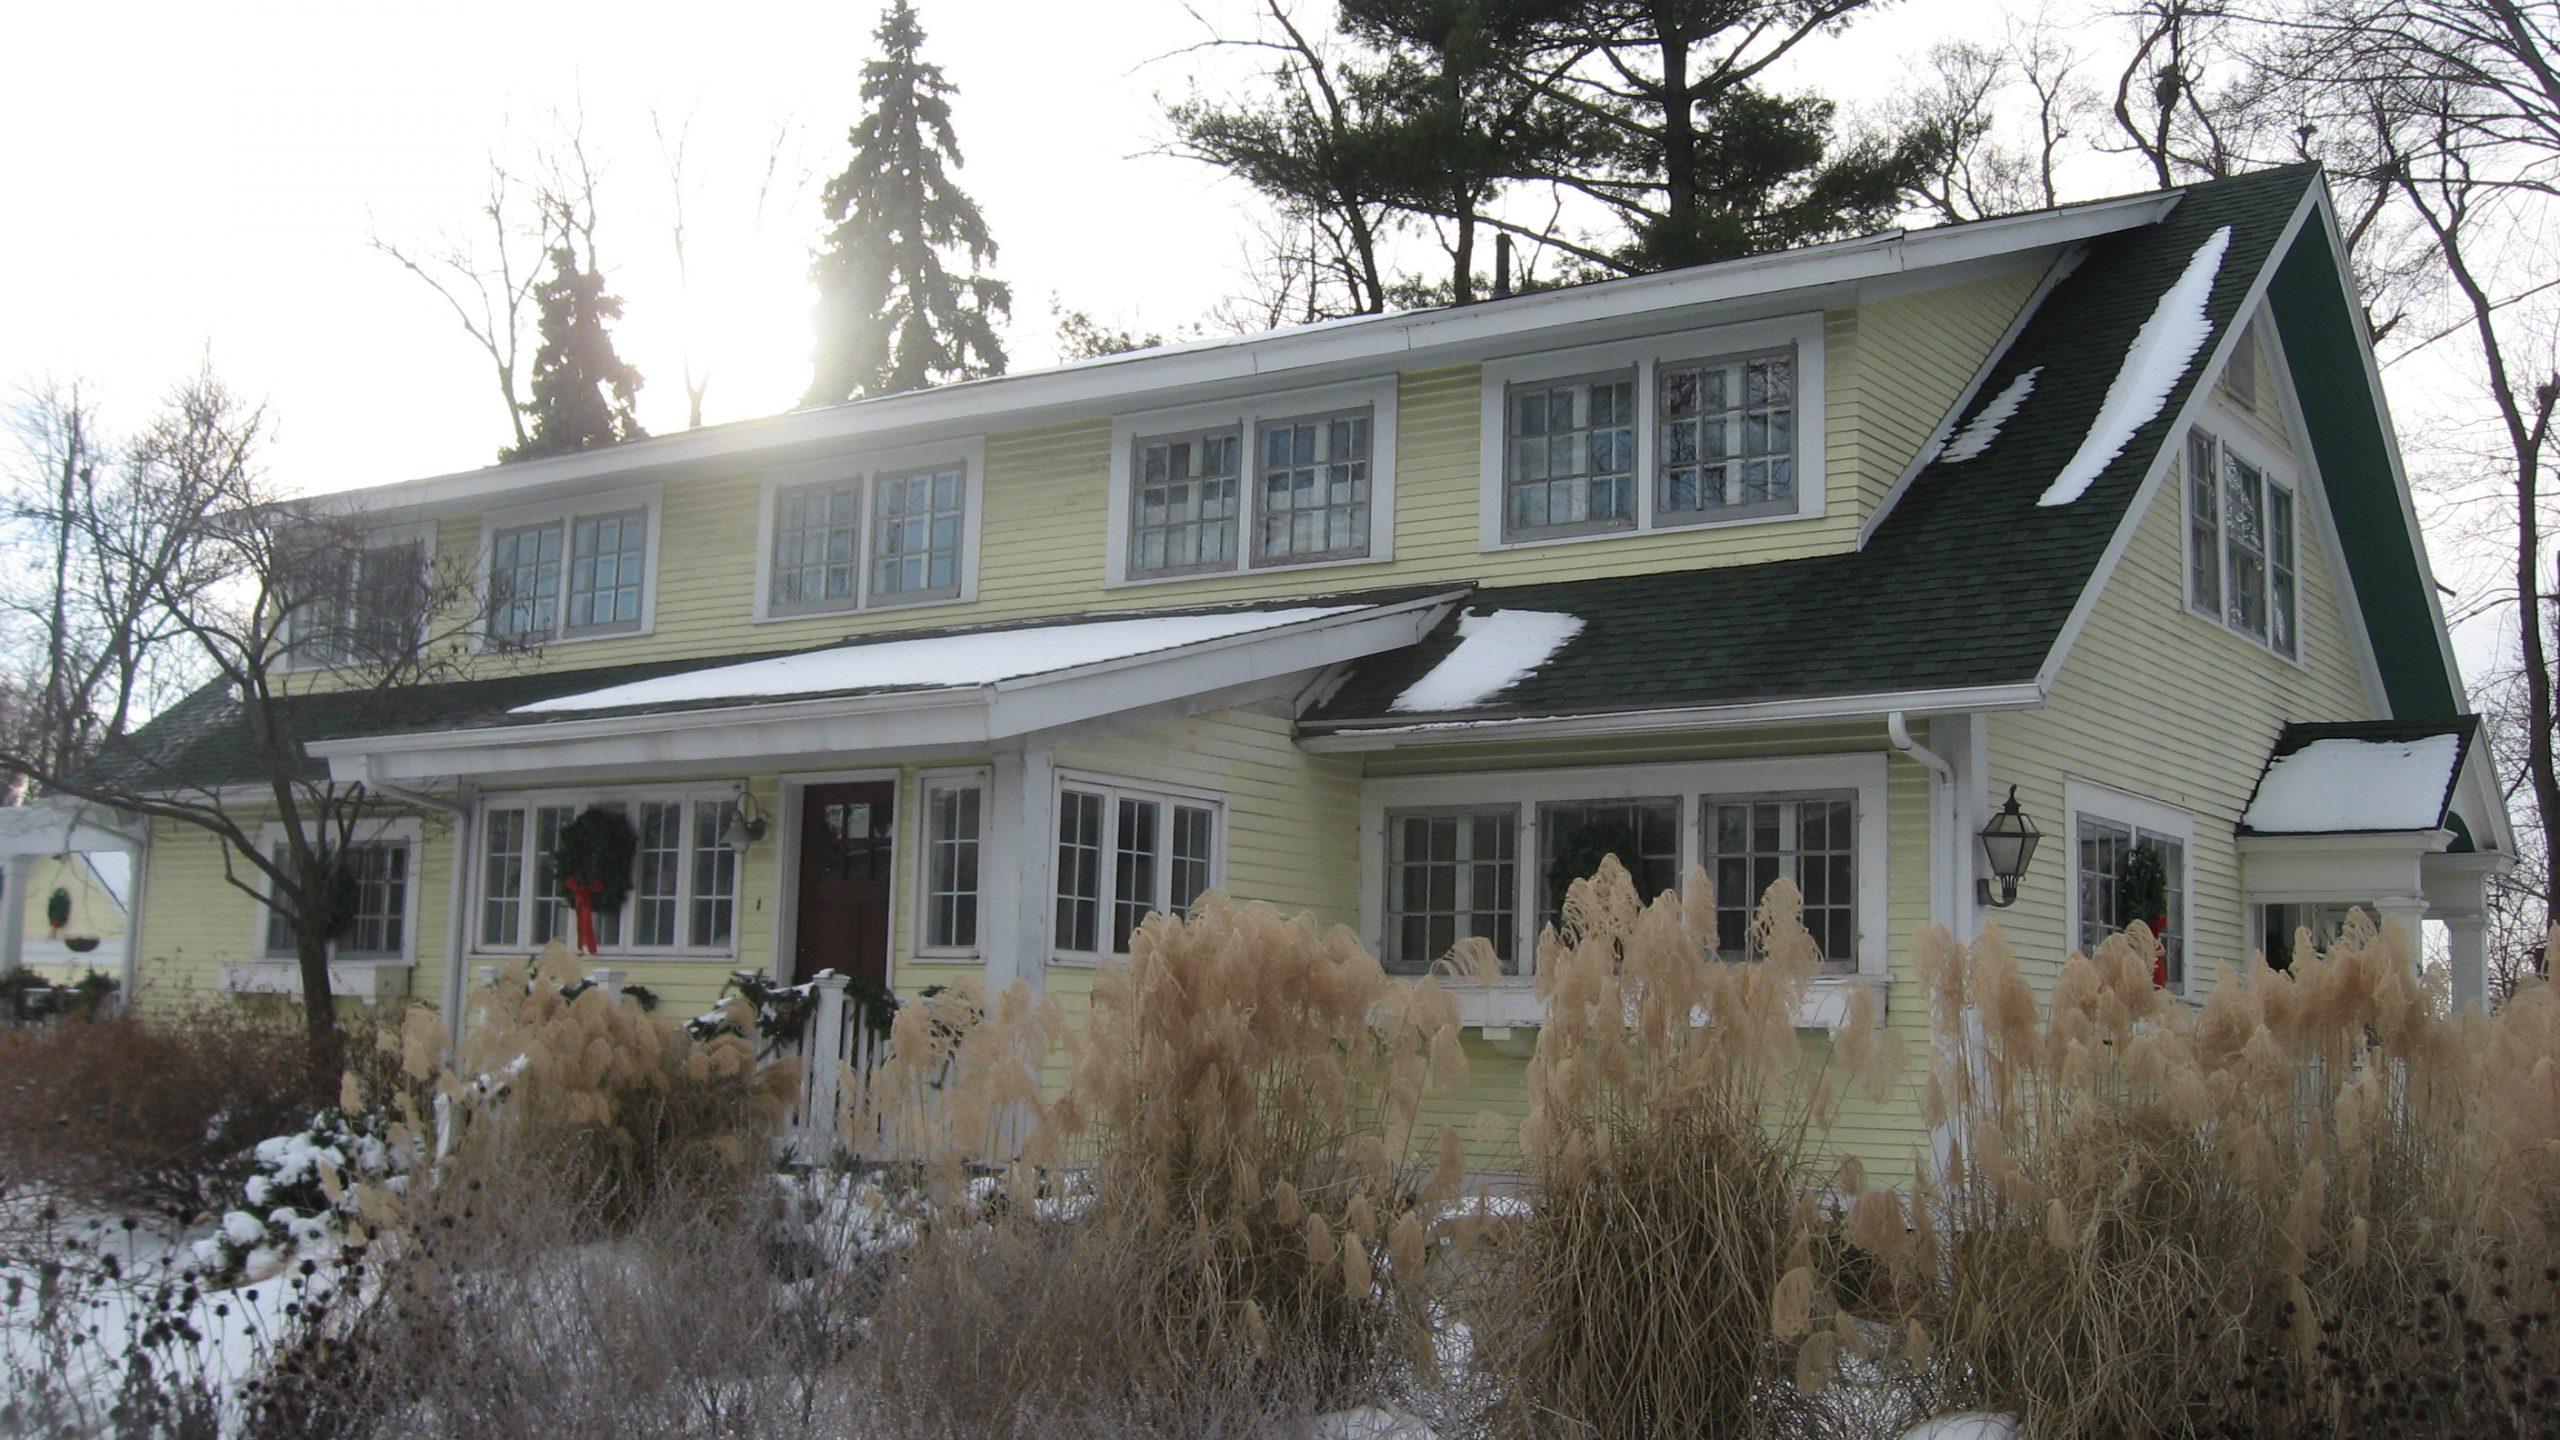 Ninde-Mead-Farnsworth House